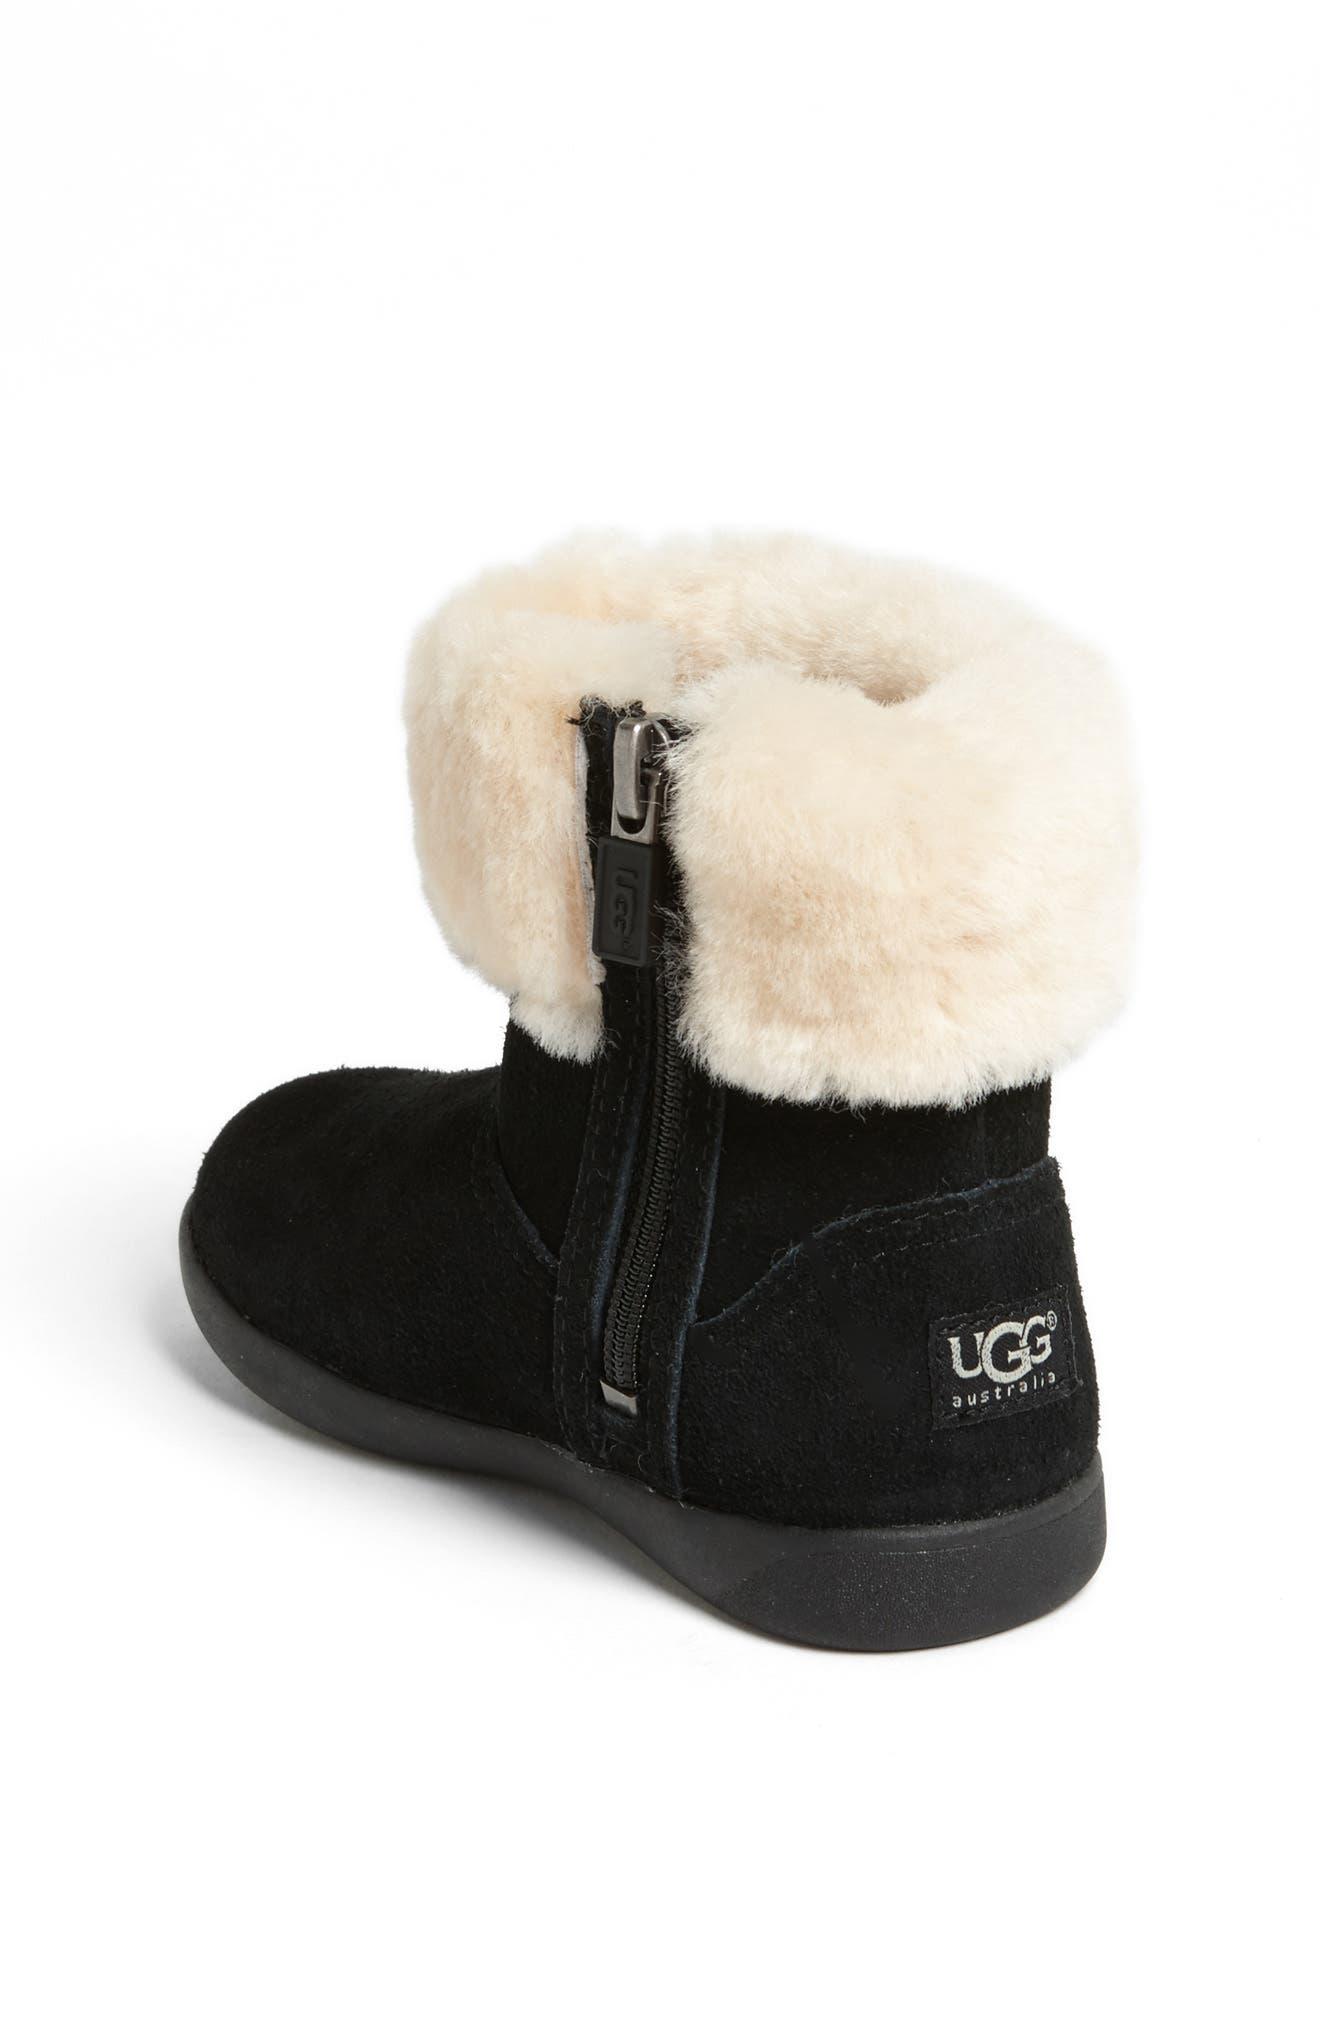 UGG<SUP>®</SUP>, Jorie II Boot, Alternate thumbnail 2, color, BLACK/ BLACK